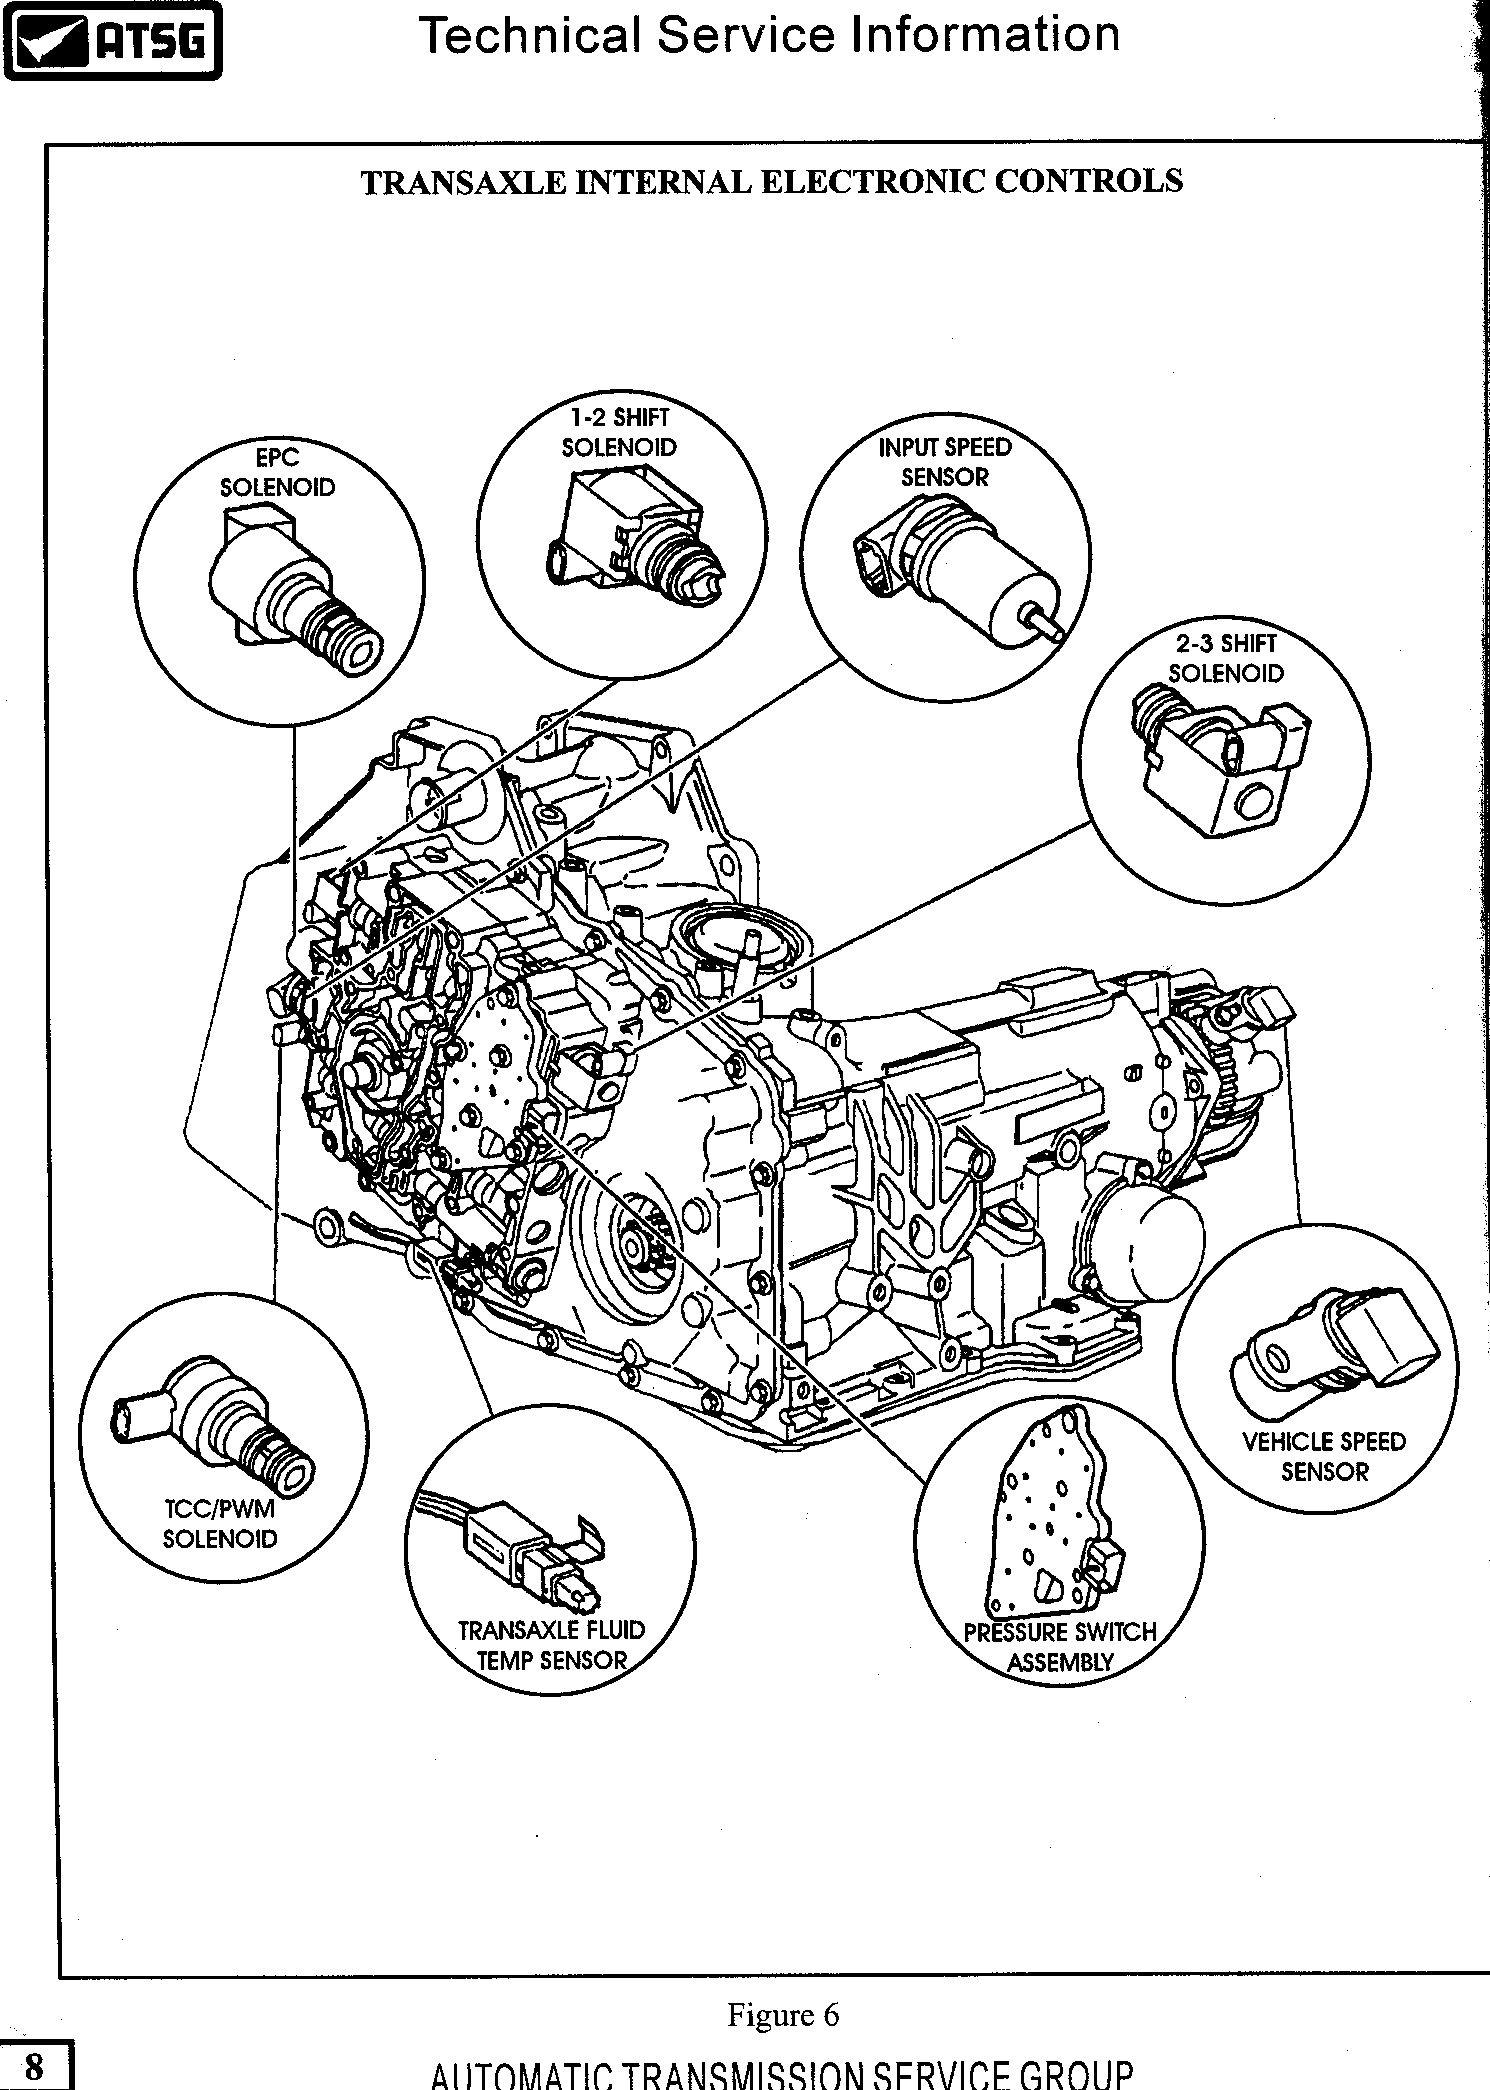 4L60e Solenoid Diagram Gm 4t65e Diagram Wiring Diagram Project